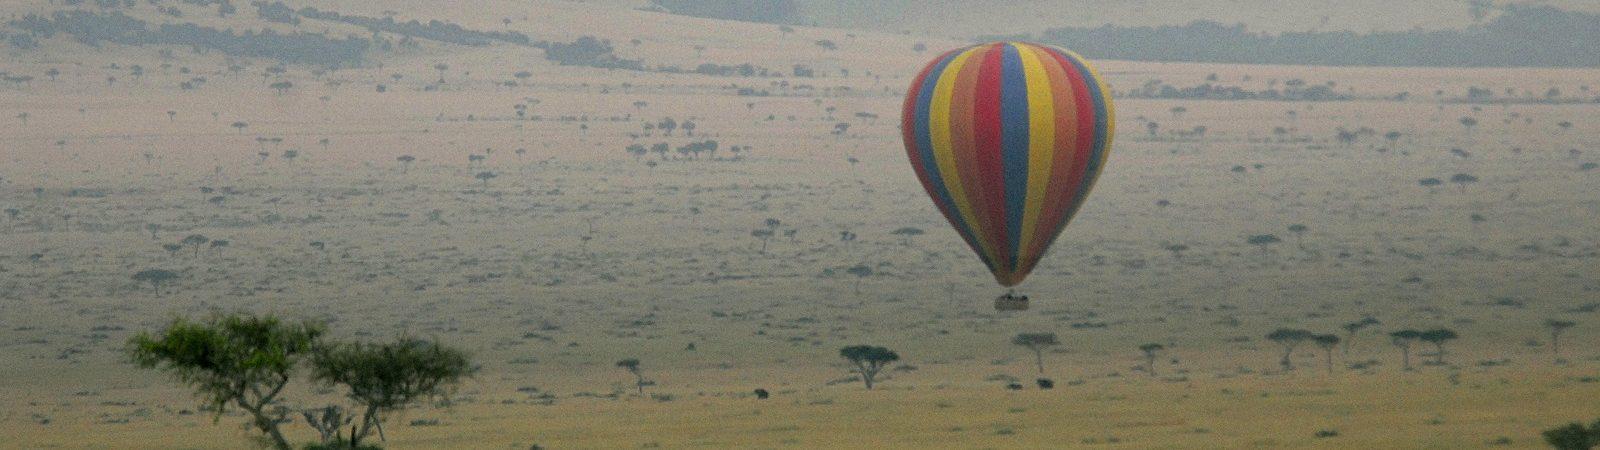 Kenya_Mara_043_2008-06-23